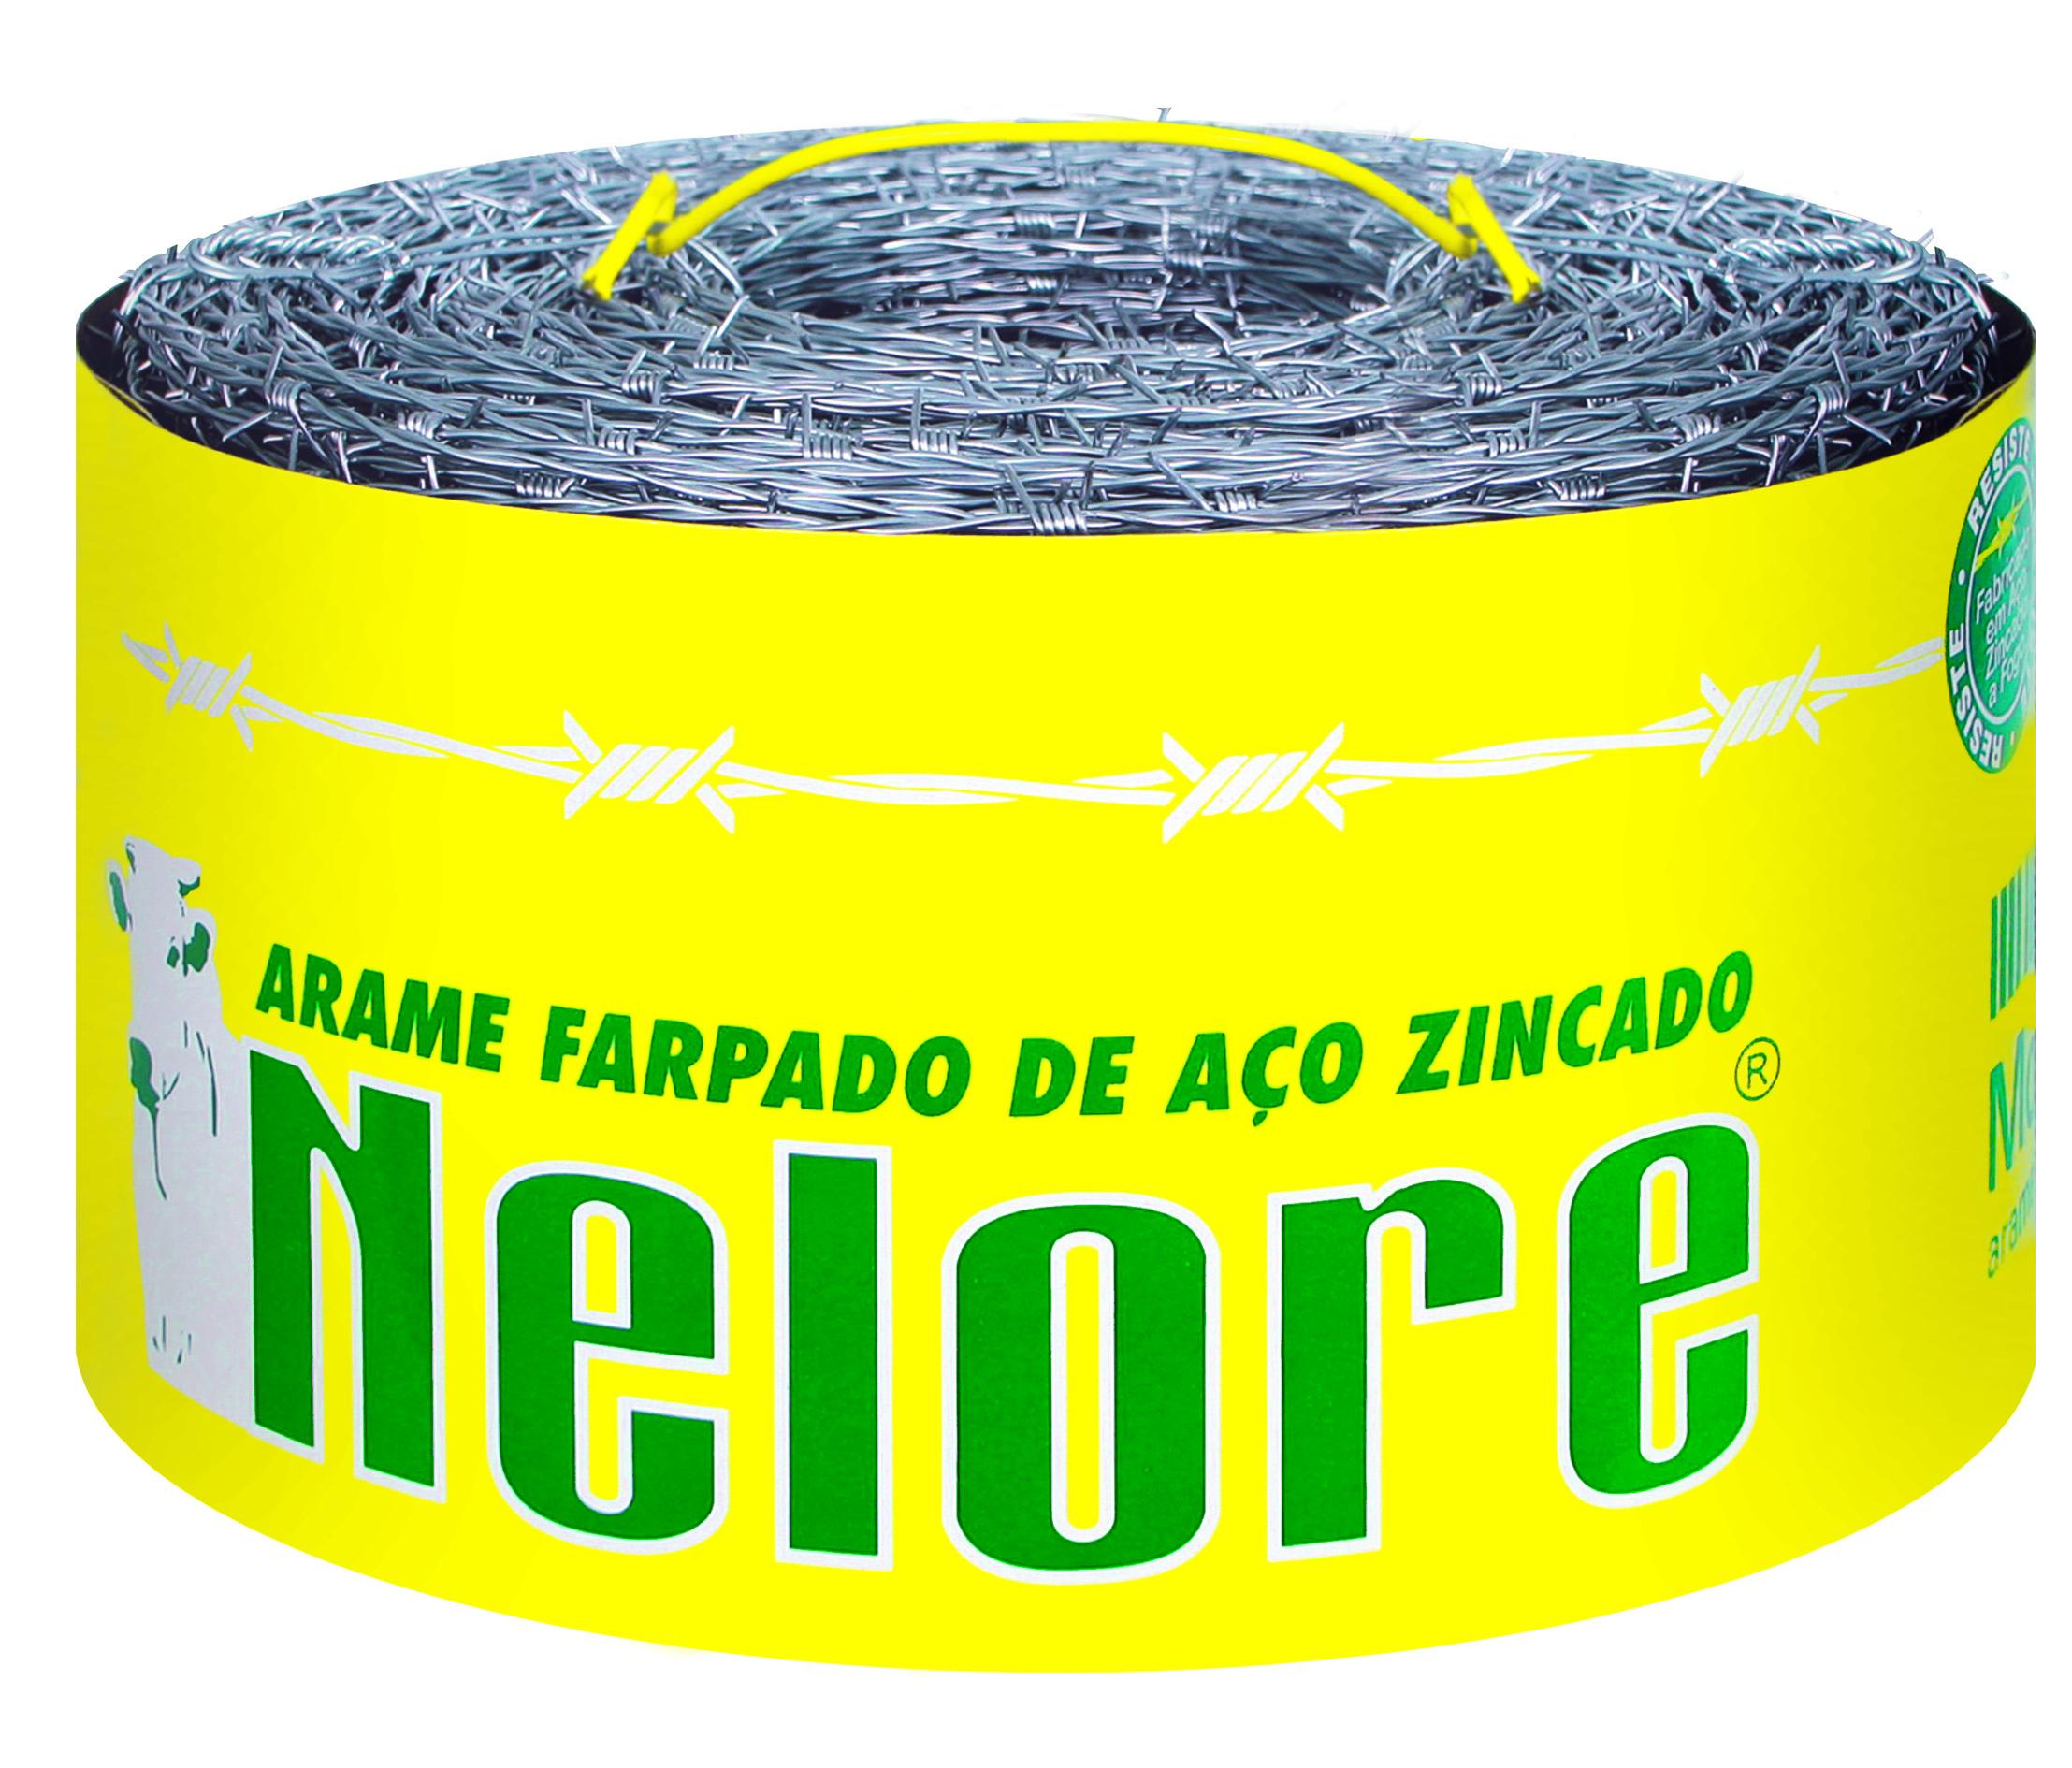 ARAME FARPADO NELORE 500 MT     MORLAN